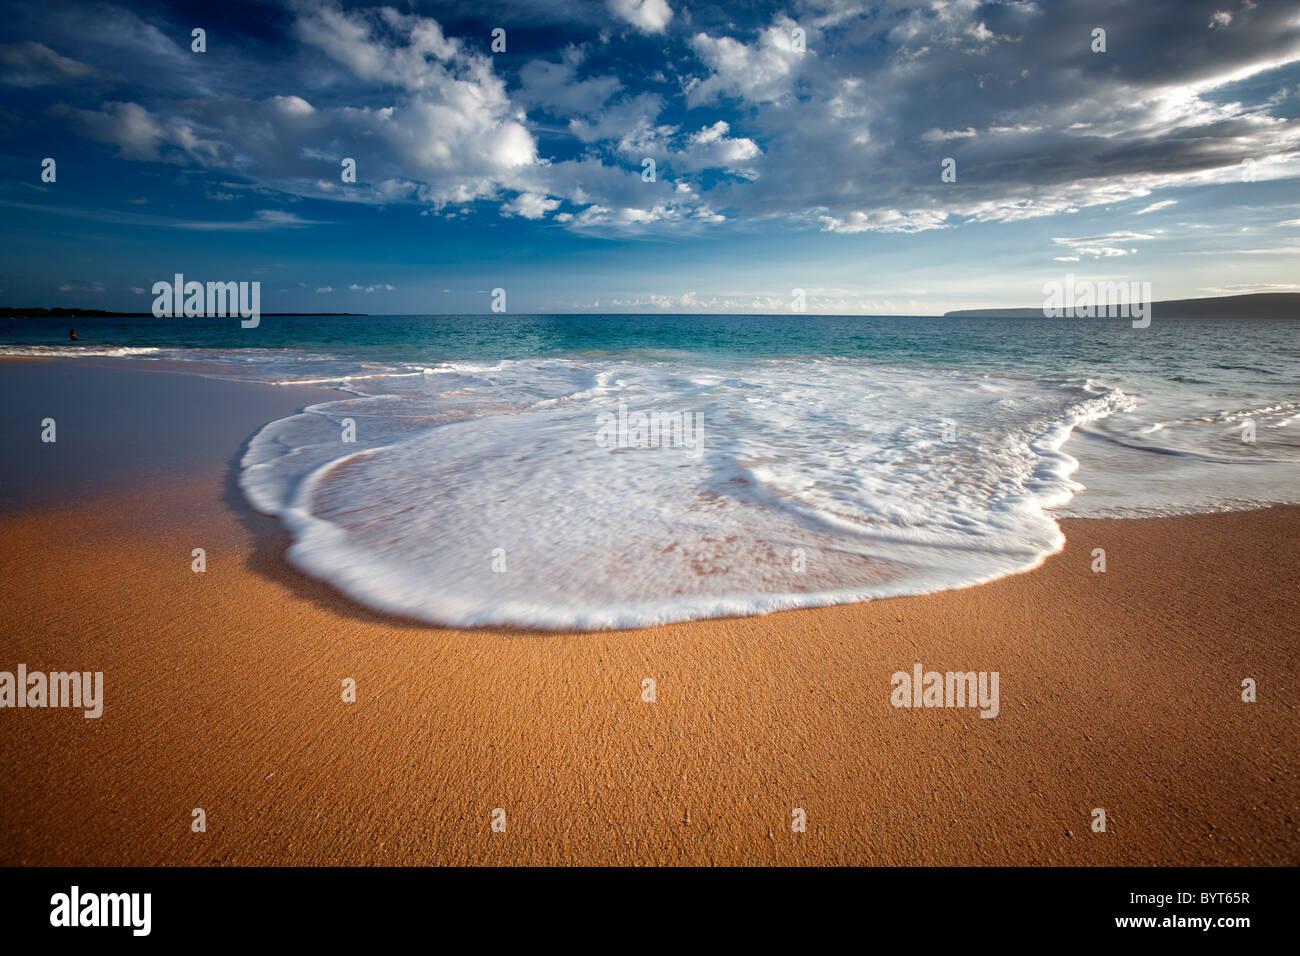 Beach, wave and clouds. Maui, Hawaii. - Stock Image